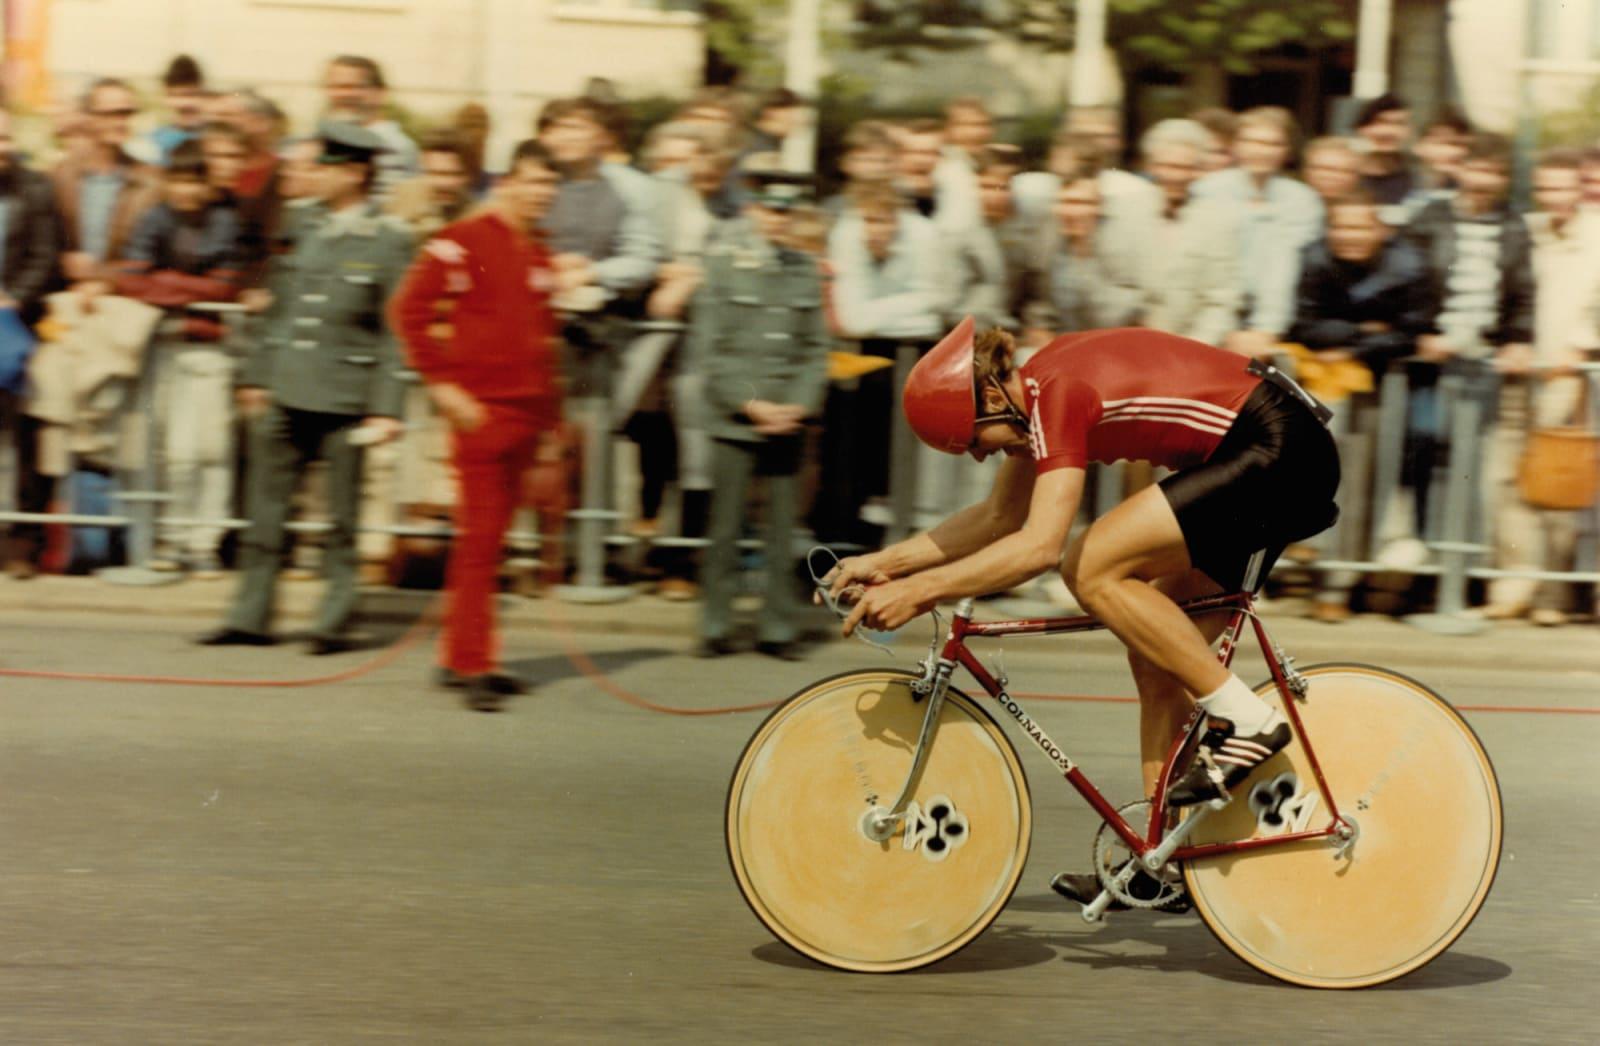 TEMPOHESTER: Sovjetrusserne var drillet på tempo. Colnago med platehjul foran og bak var standard oppskrift for seier.